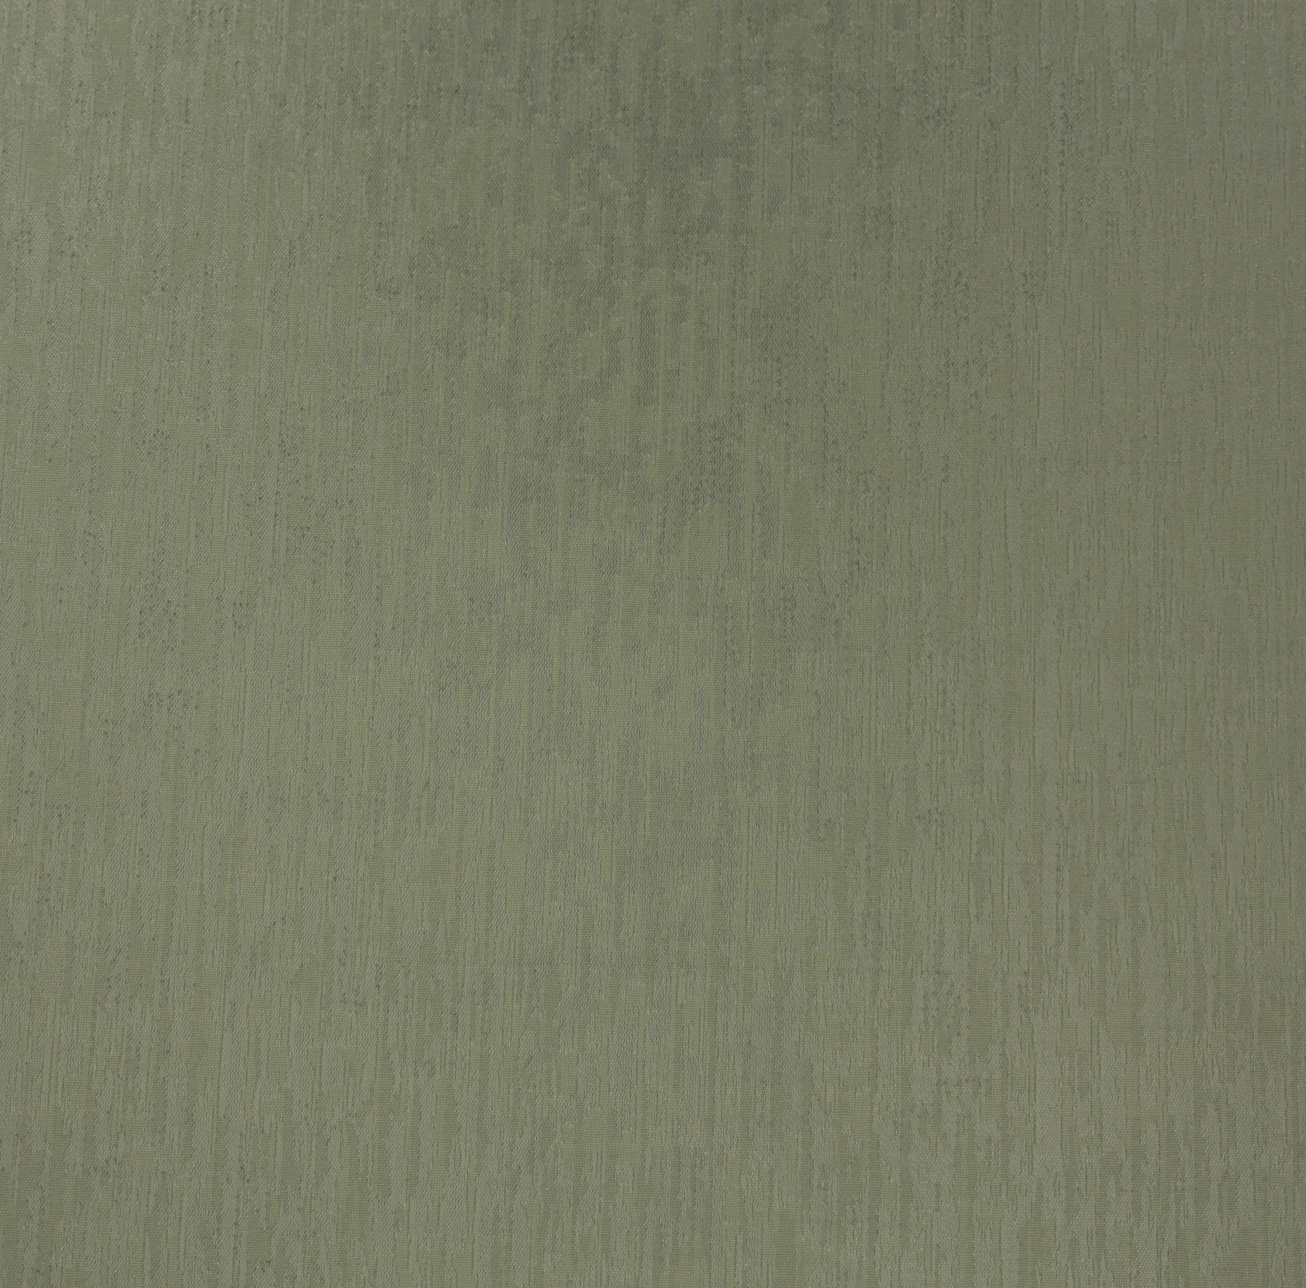 Итальянские обои Print4,  коллекция Kandinsky, артикул9610G1